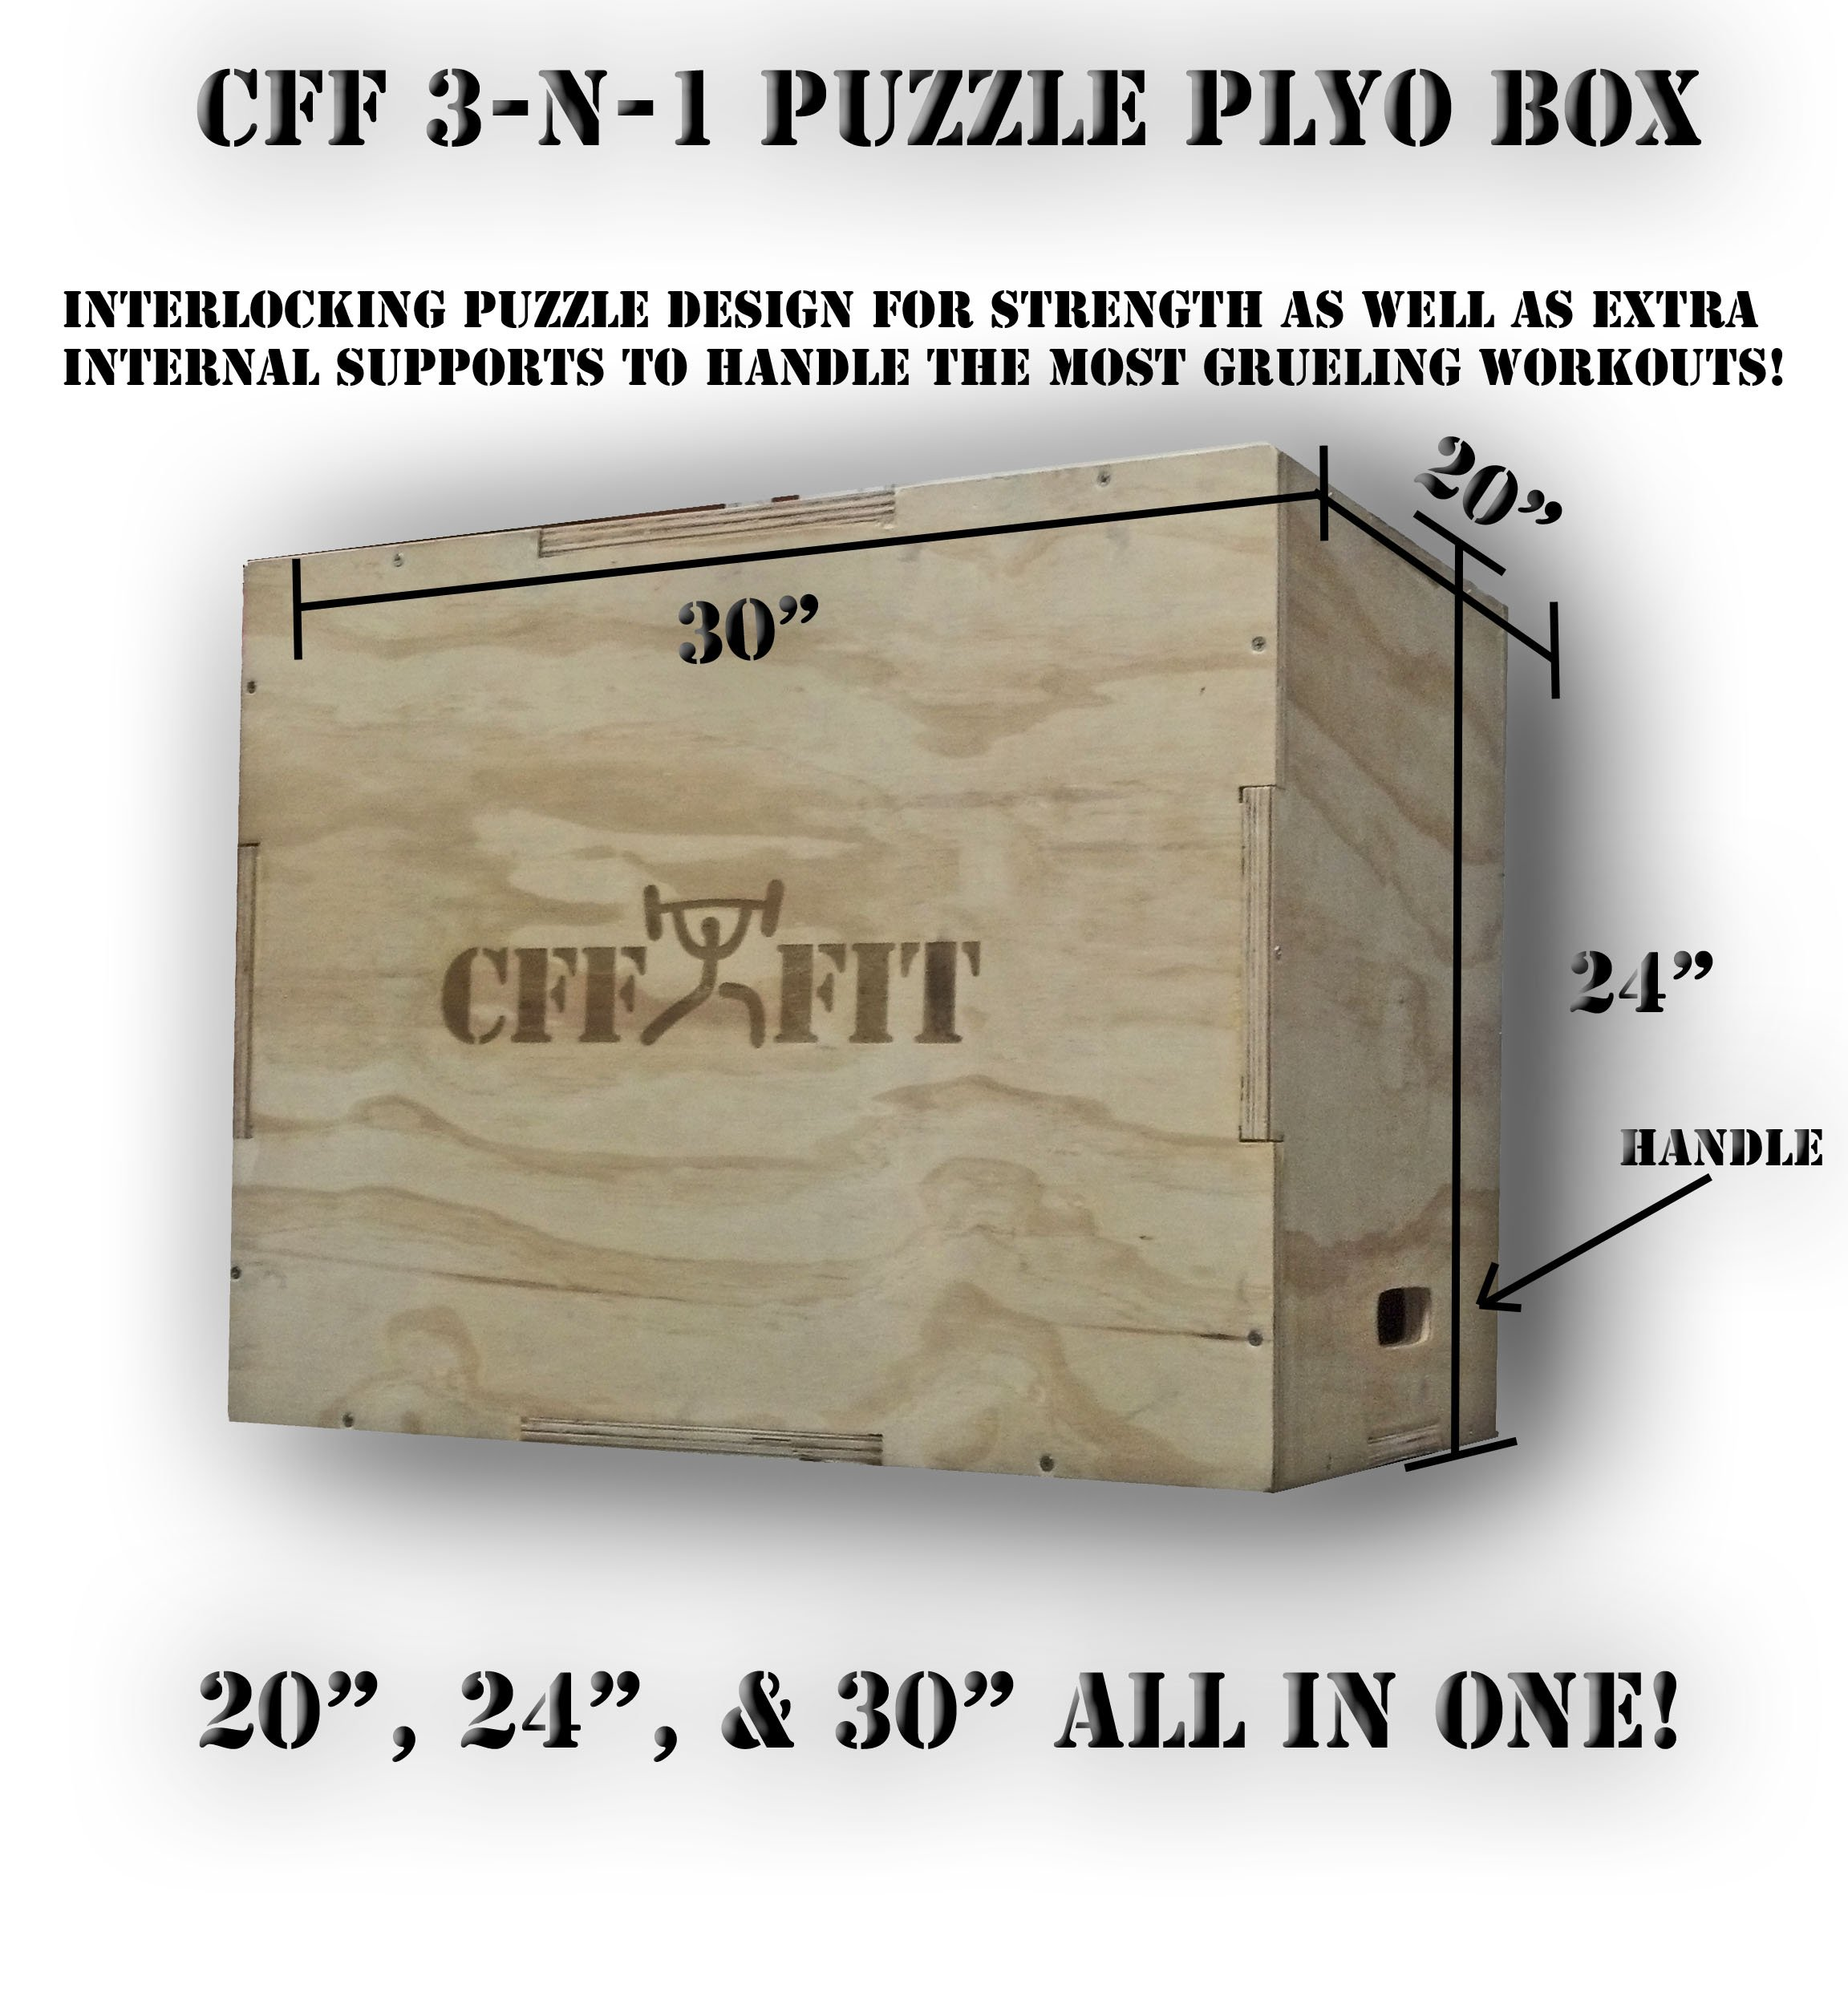 CFF 3 - N - 1 Wood Puzzle Plyo Box - 20/24/30 inch - Great for Cross Training, MMA, or Plyometric Agility Training